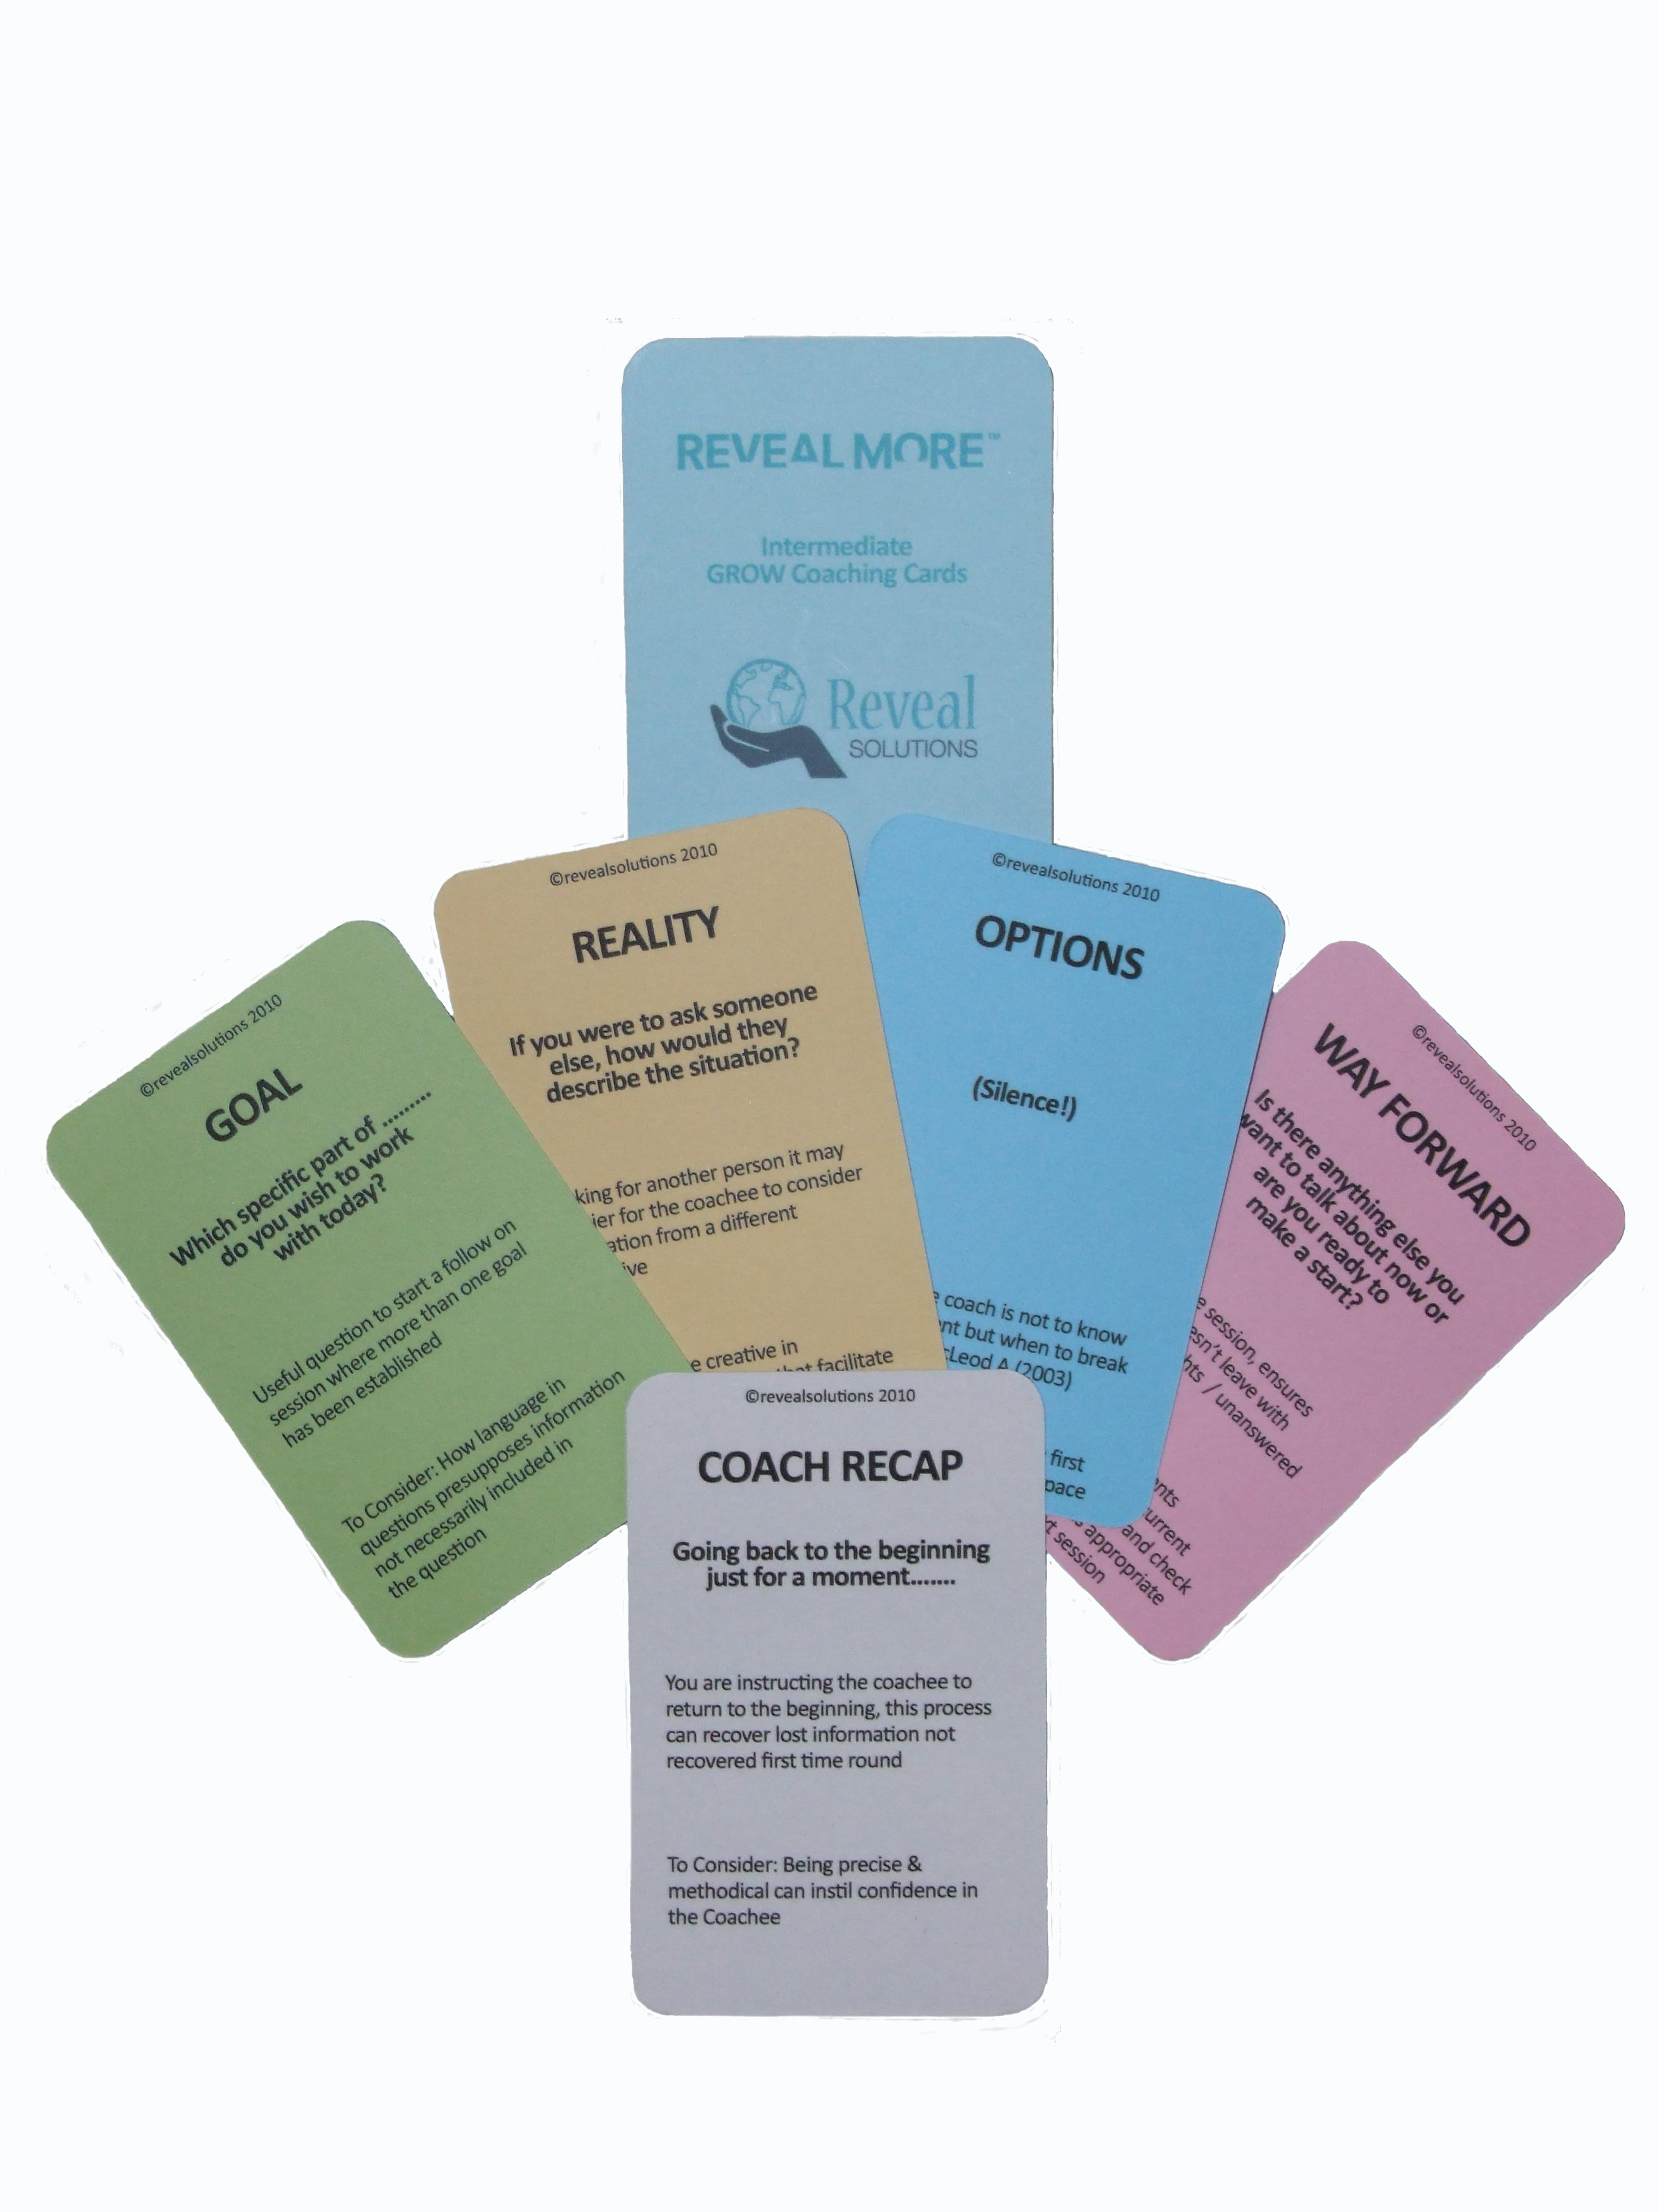 GROW coaching model cards intermediate, coaching cards, coaching products, coasching questions